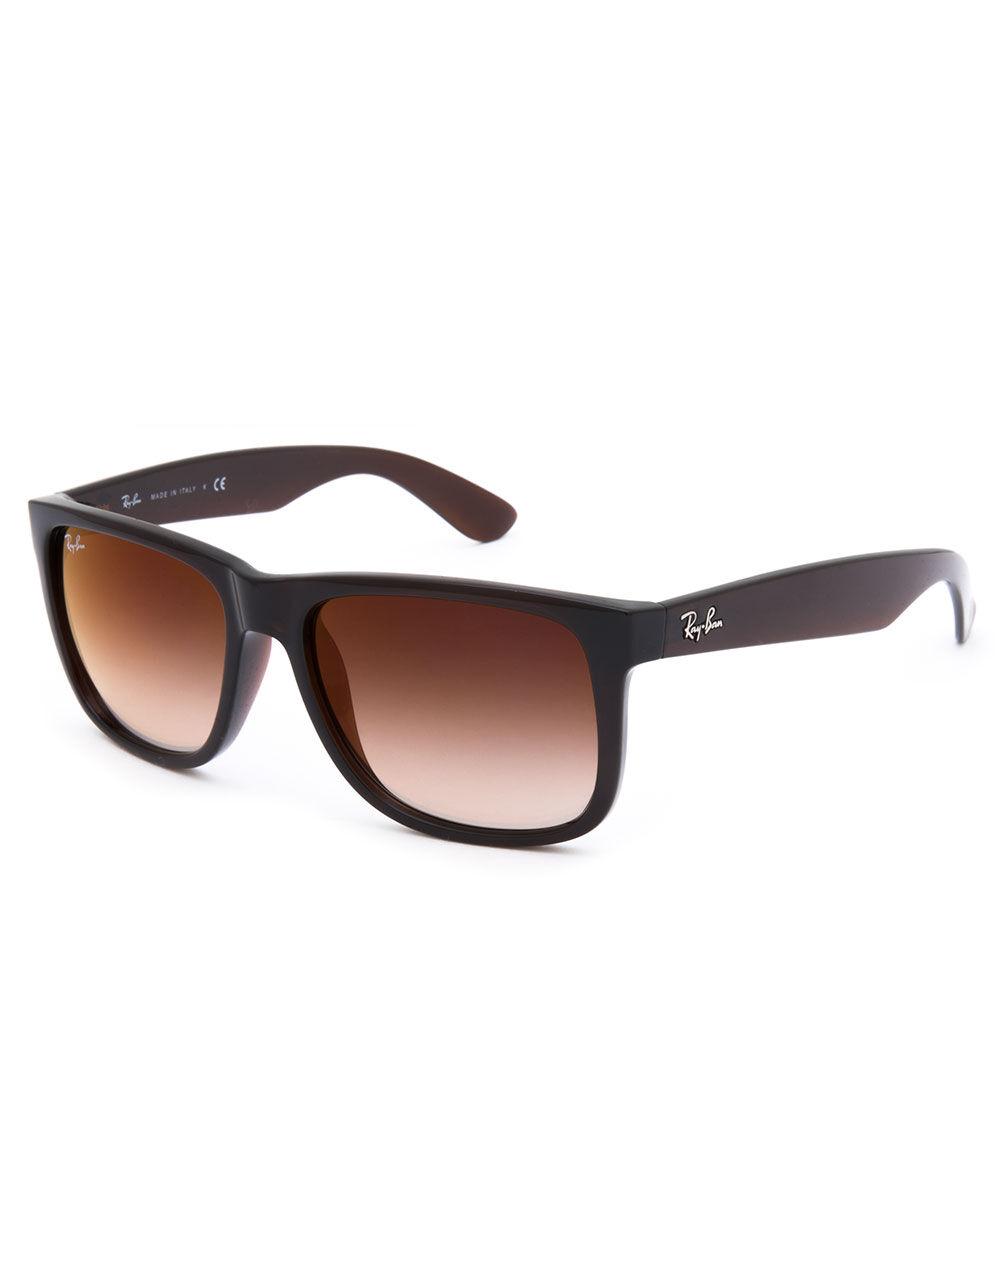 RAY-BAN Justin Flash Gradient Brown Sunglasses